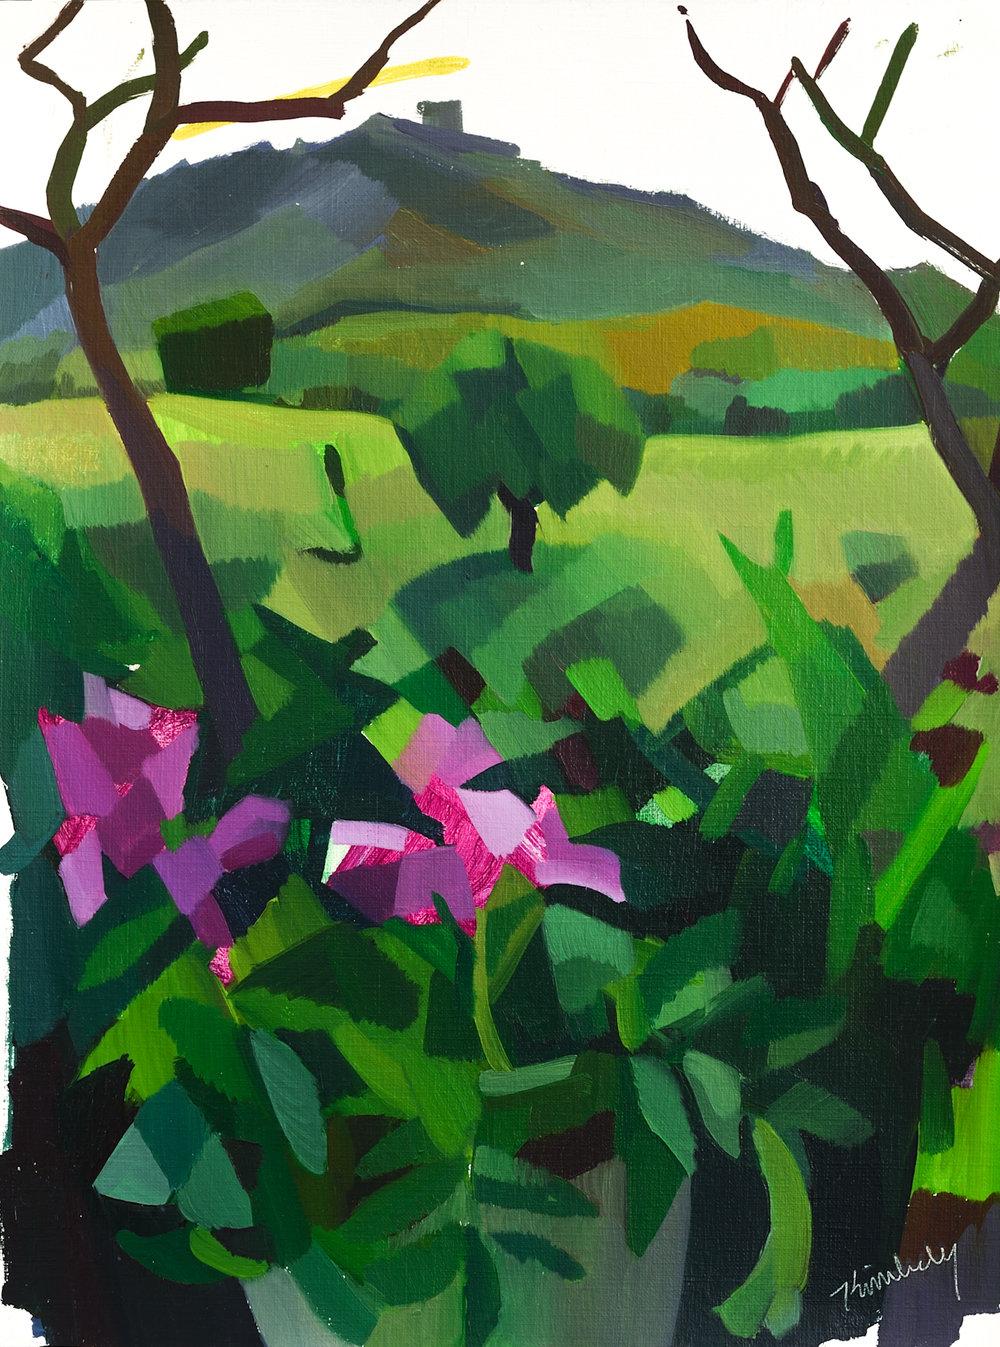 "Flores, Alentejano,   Oil on Paper, 16"" x 12,"" 2014.  Private Collection."